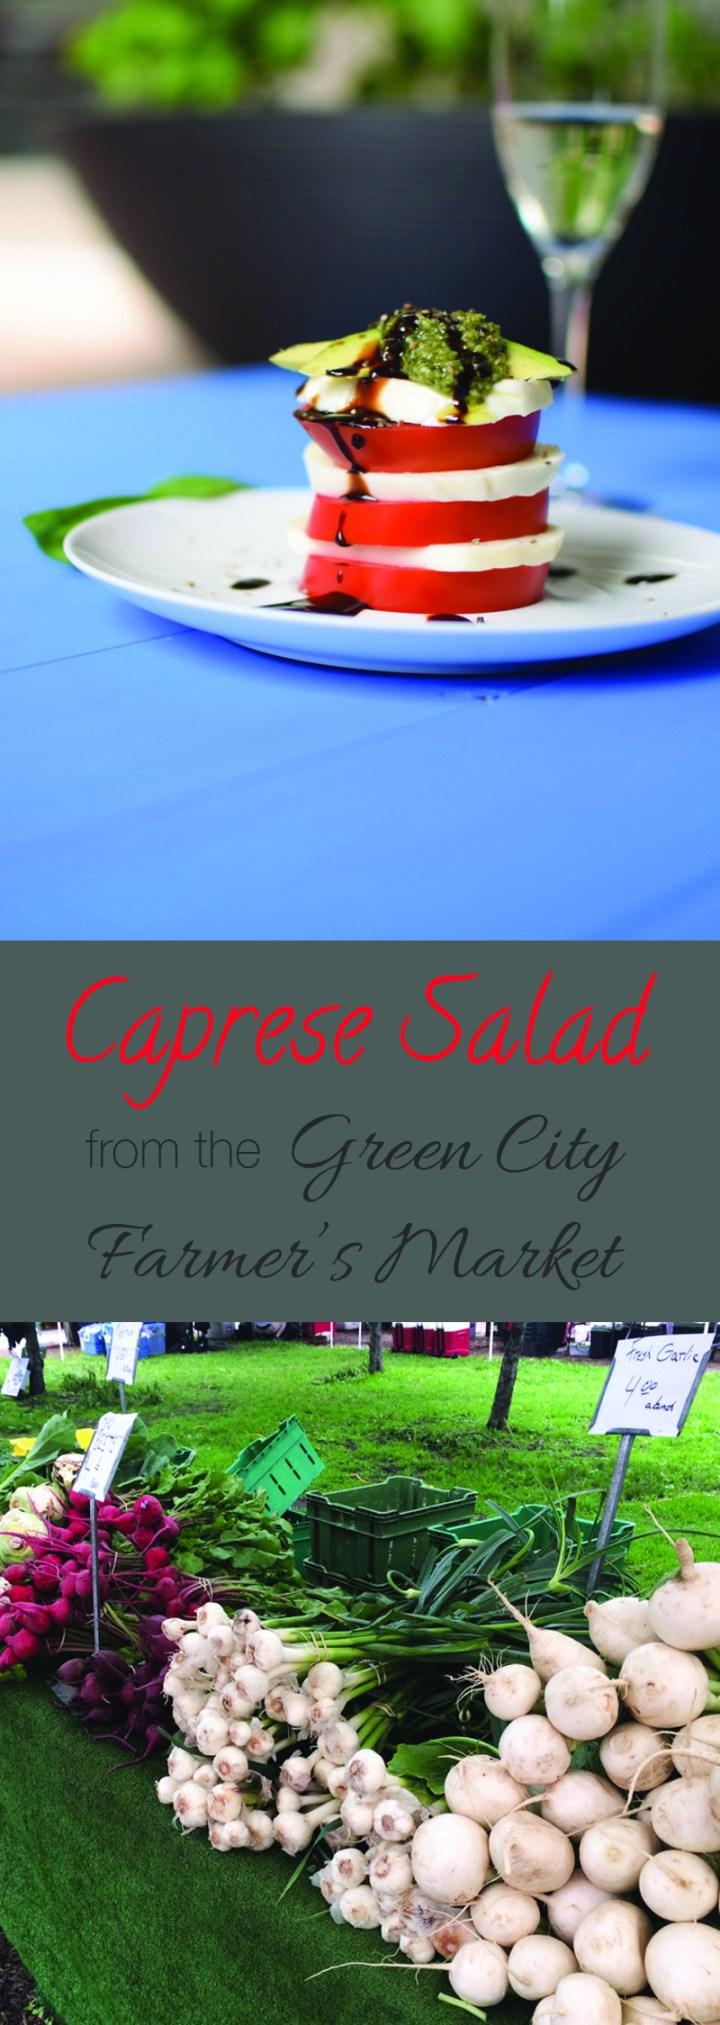 Caprese Salad from the Green City Farmer's Market